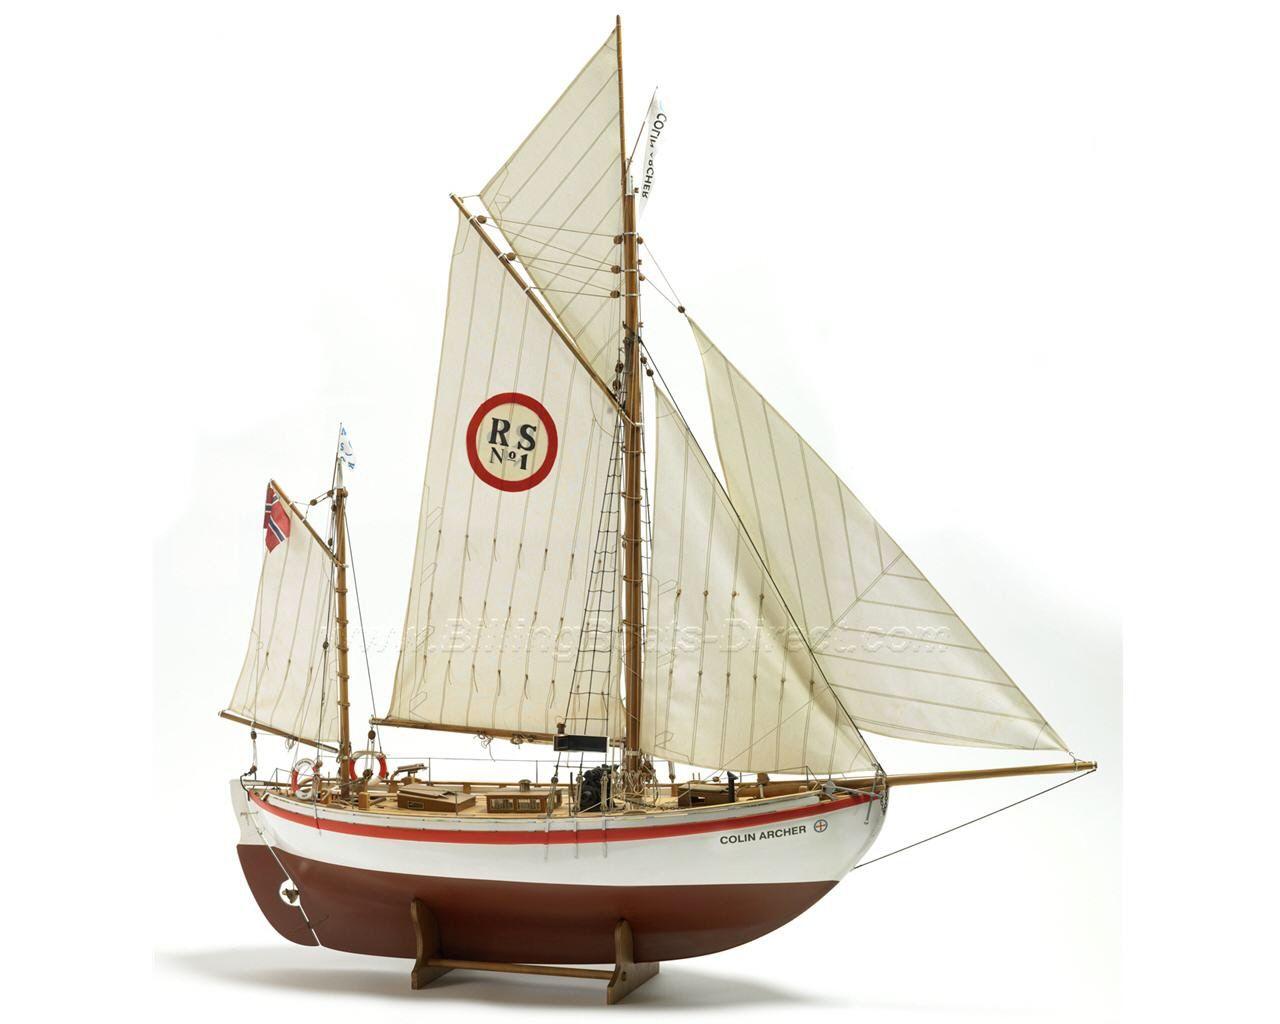 Colin Archer Model Boat Kit - Billing Boats (B606)